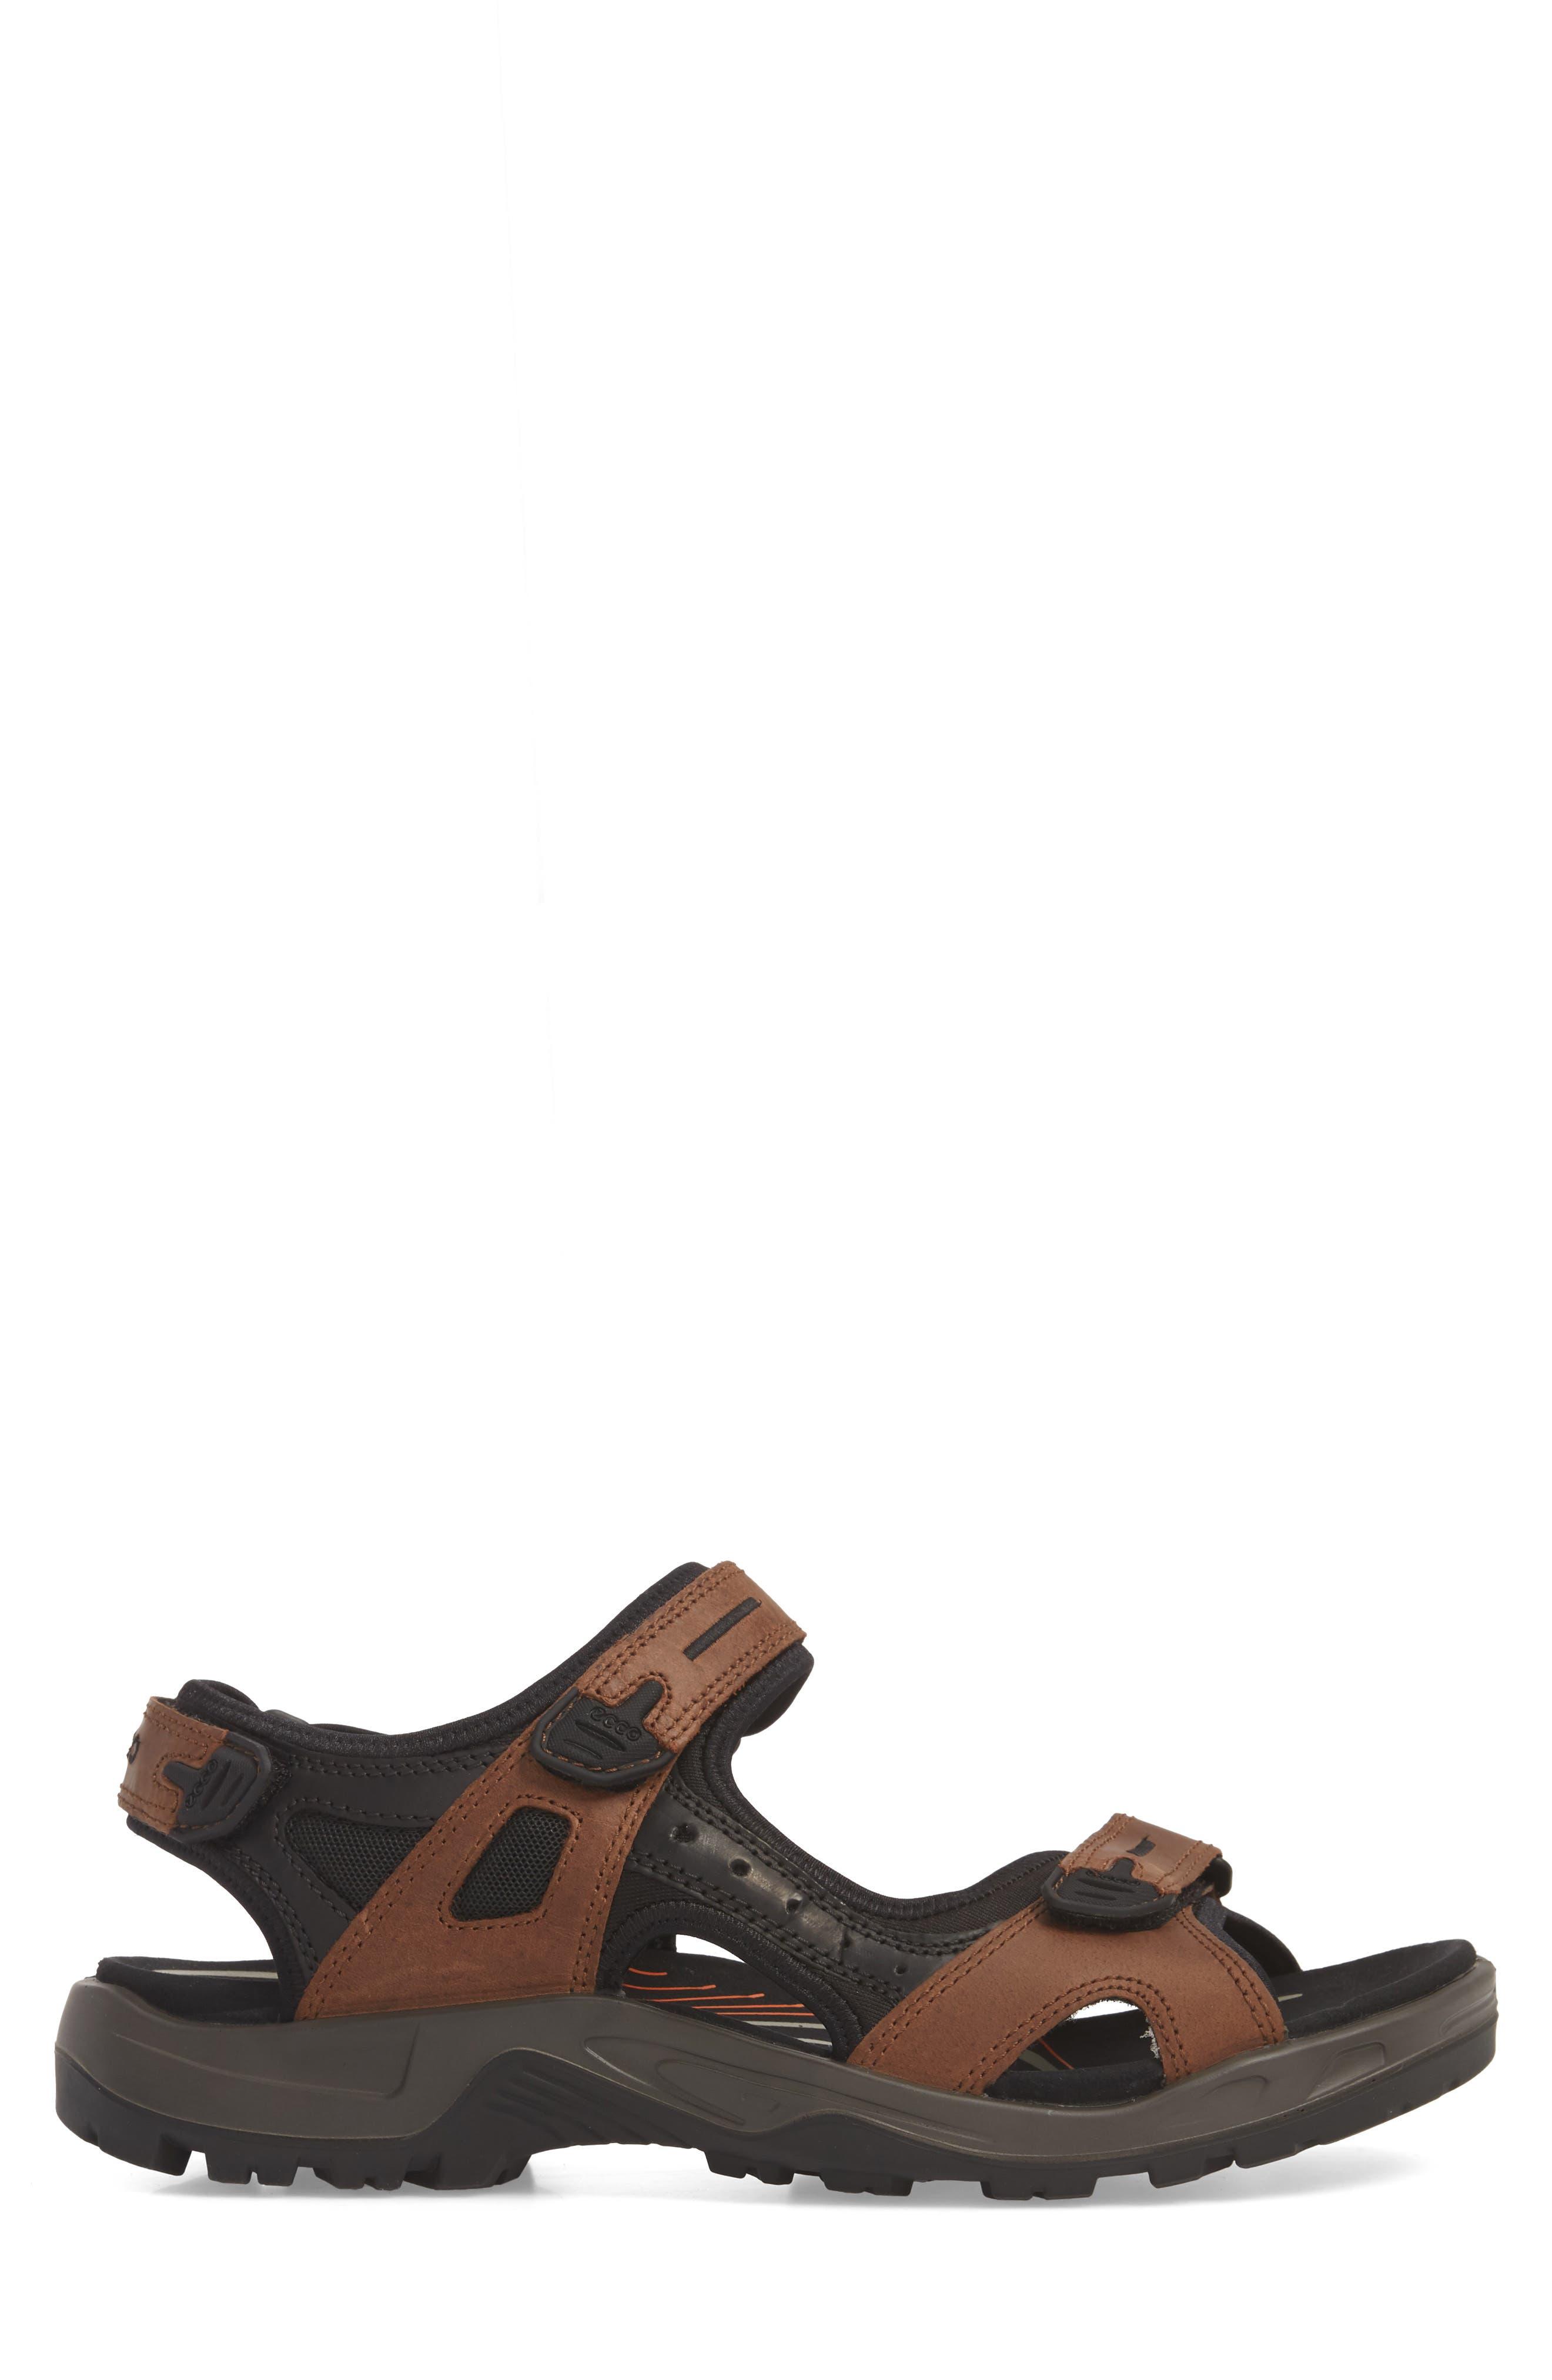 'Yucatan' Sandal,                             Alternate thumbnail 4, color,                             BROWN/BLACK